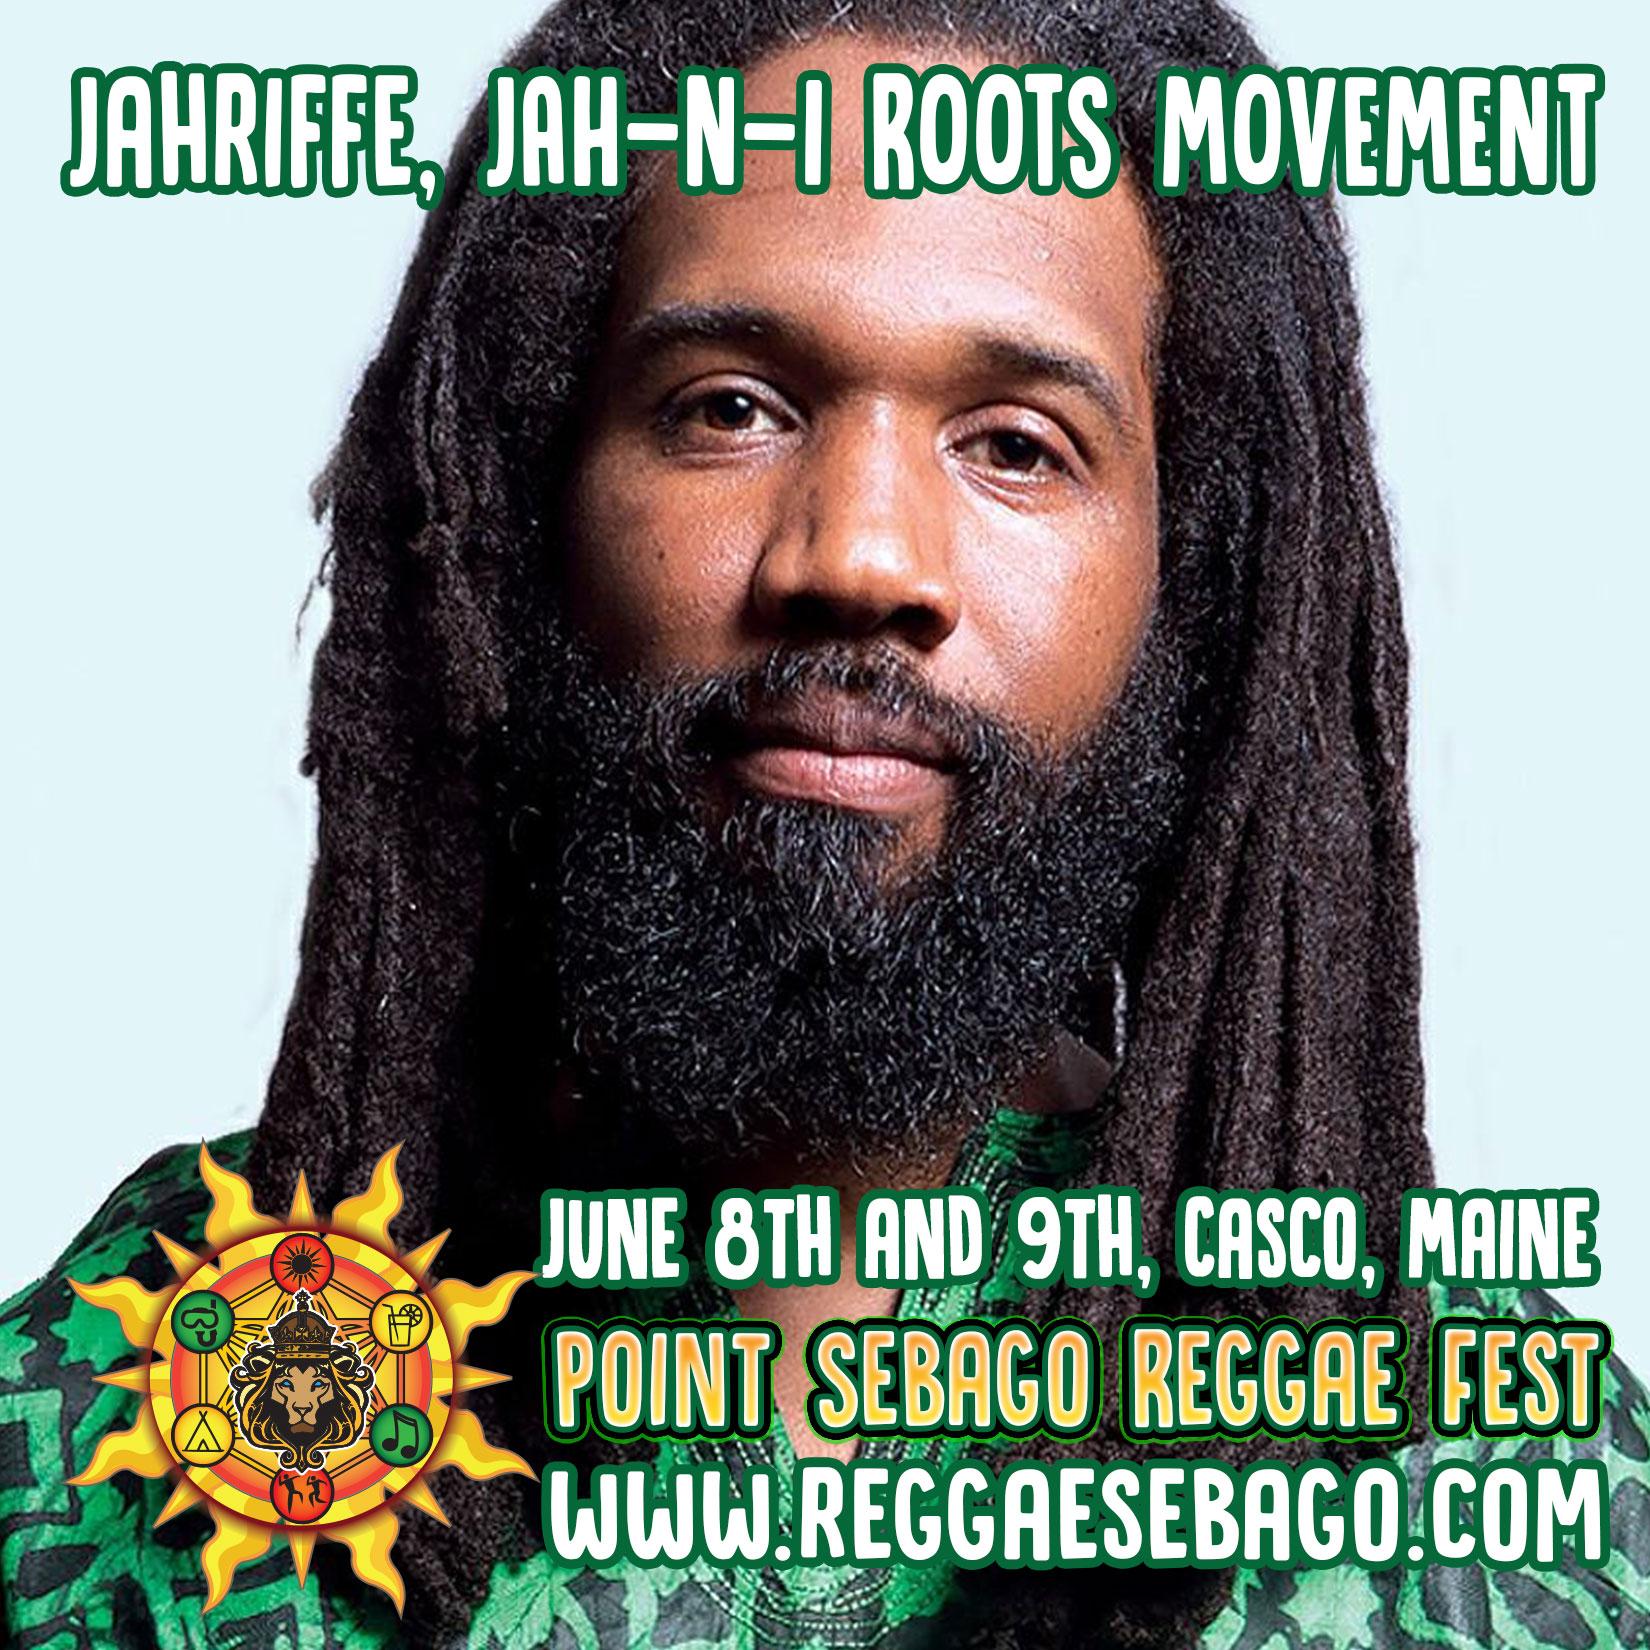 Jahriffe, Point Sebago Reggae Festival